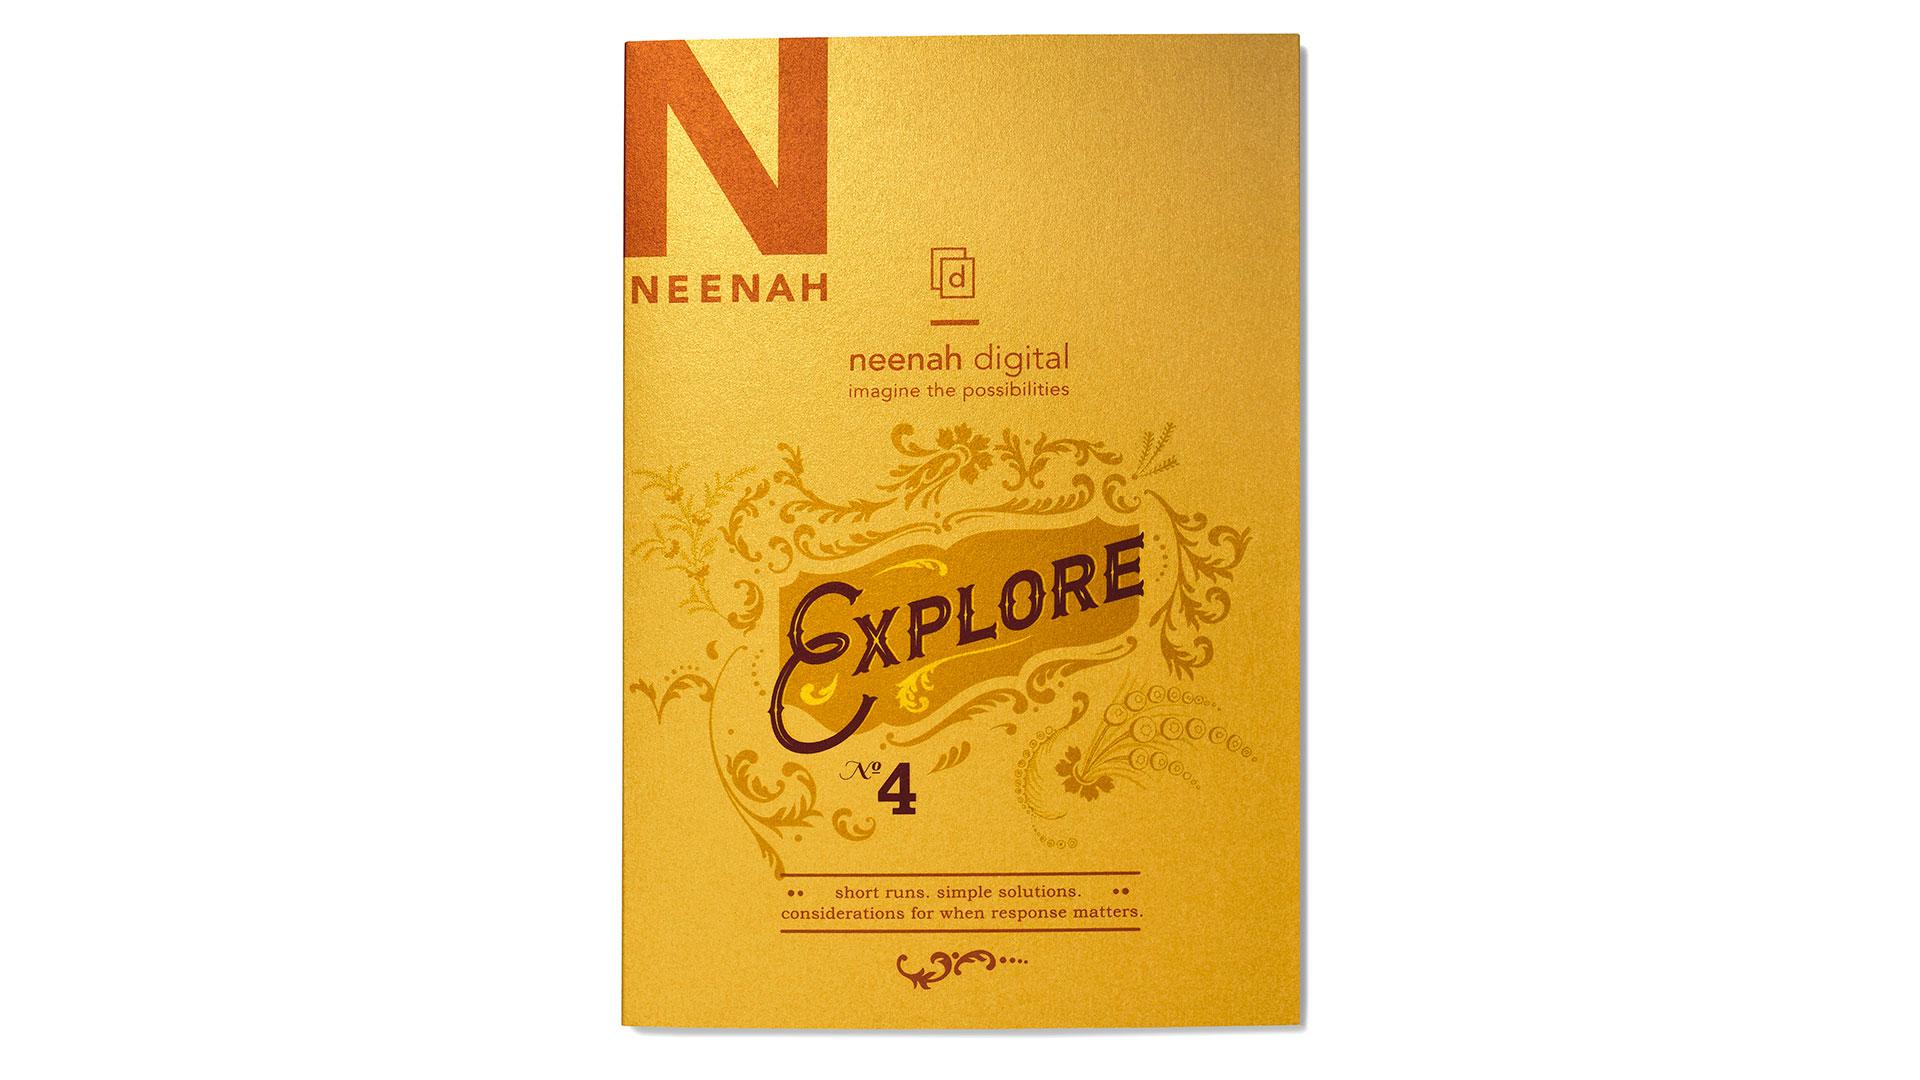 Neenah Explore 4 Ideas For Digitally Printed Short Runs